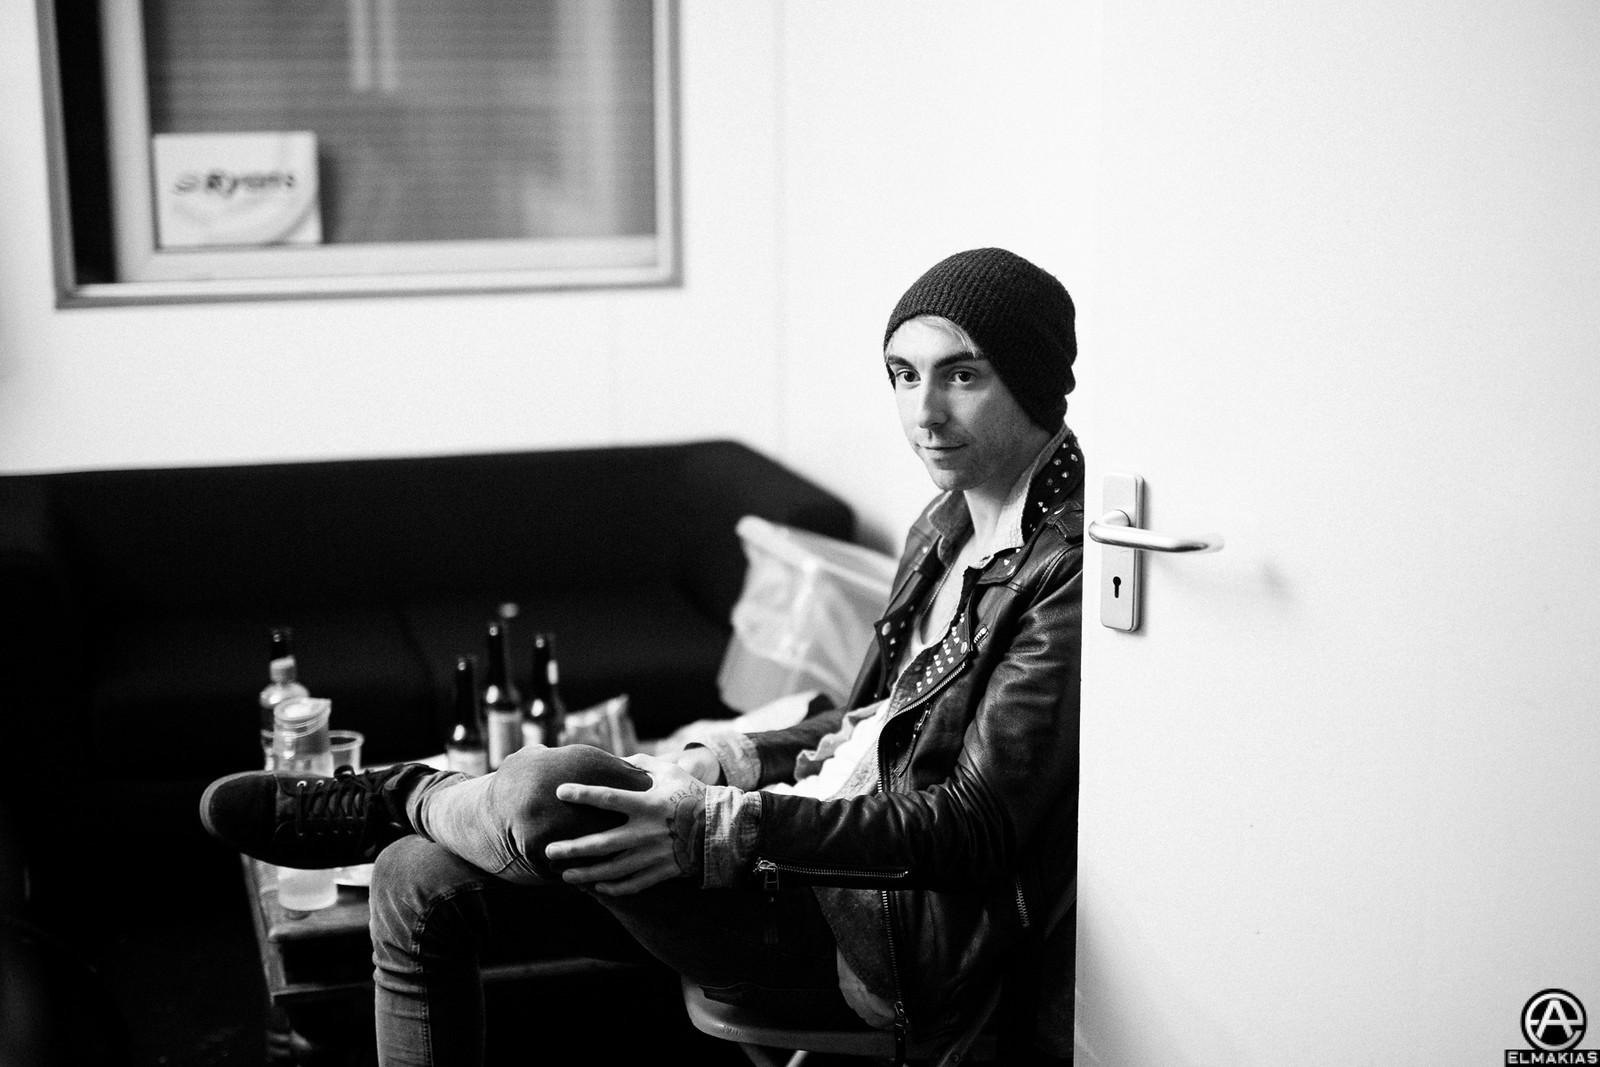 Alex Gaskarth of All Time Low at Reading Festival 2015 by Adam Elmakias